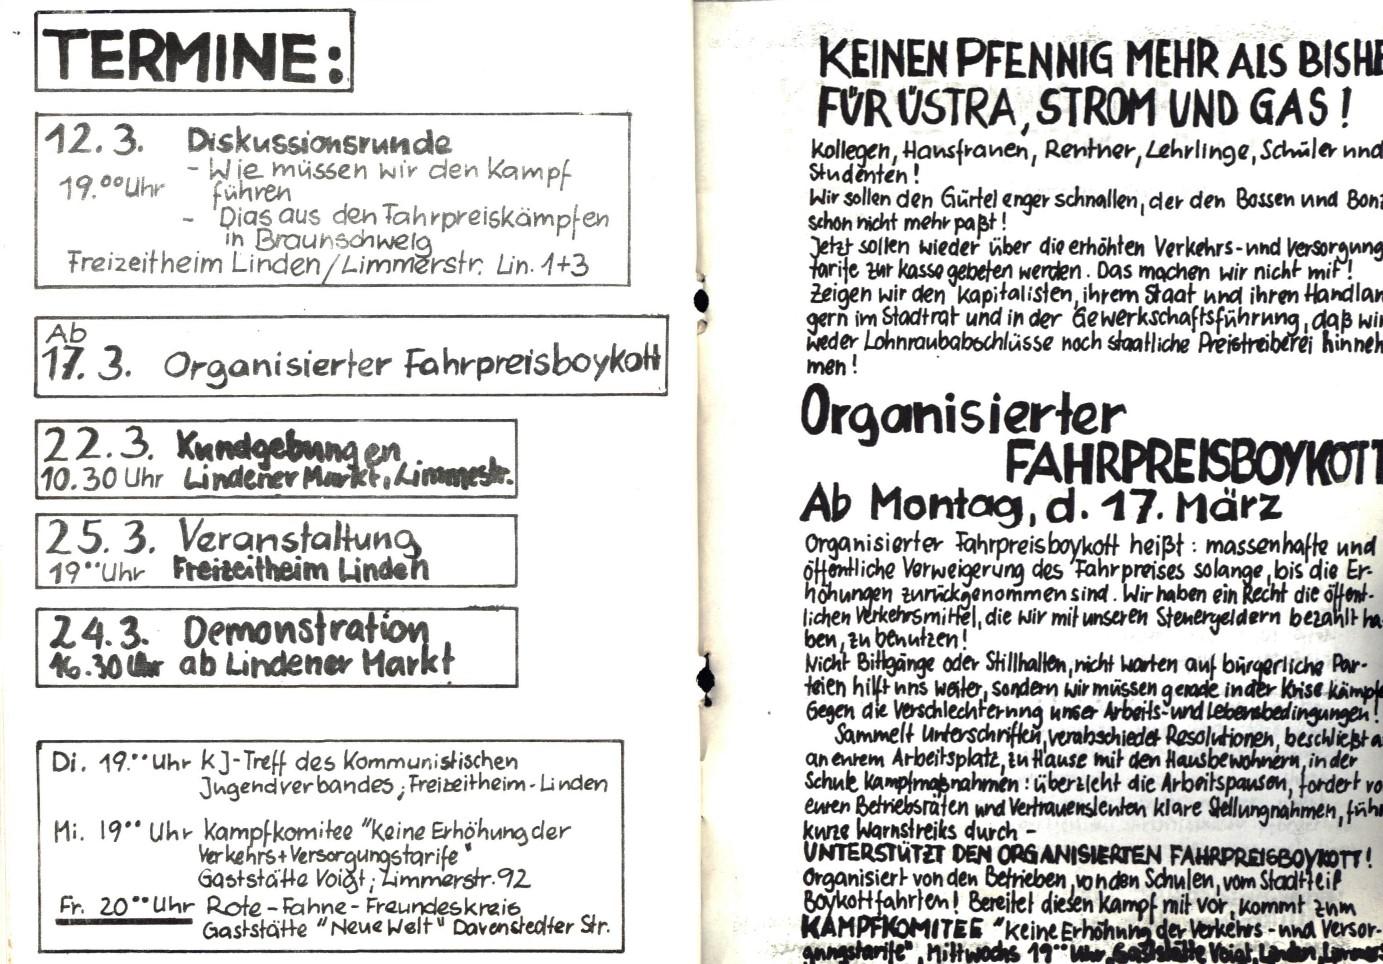 Hannover_AO_1975_Fahrpreisboykott_26